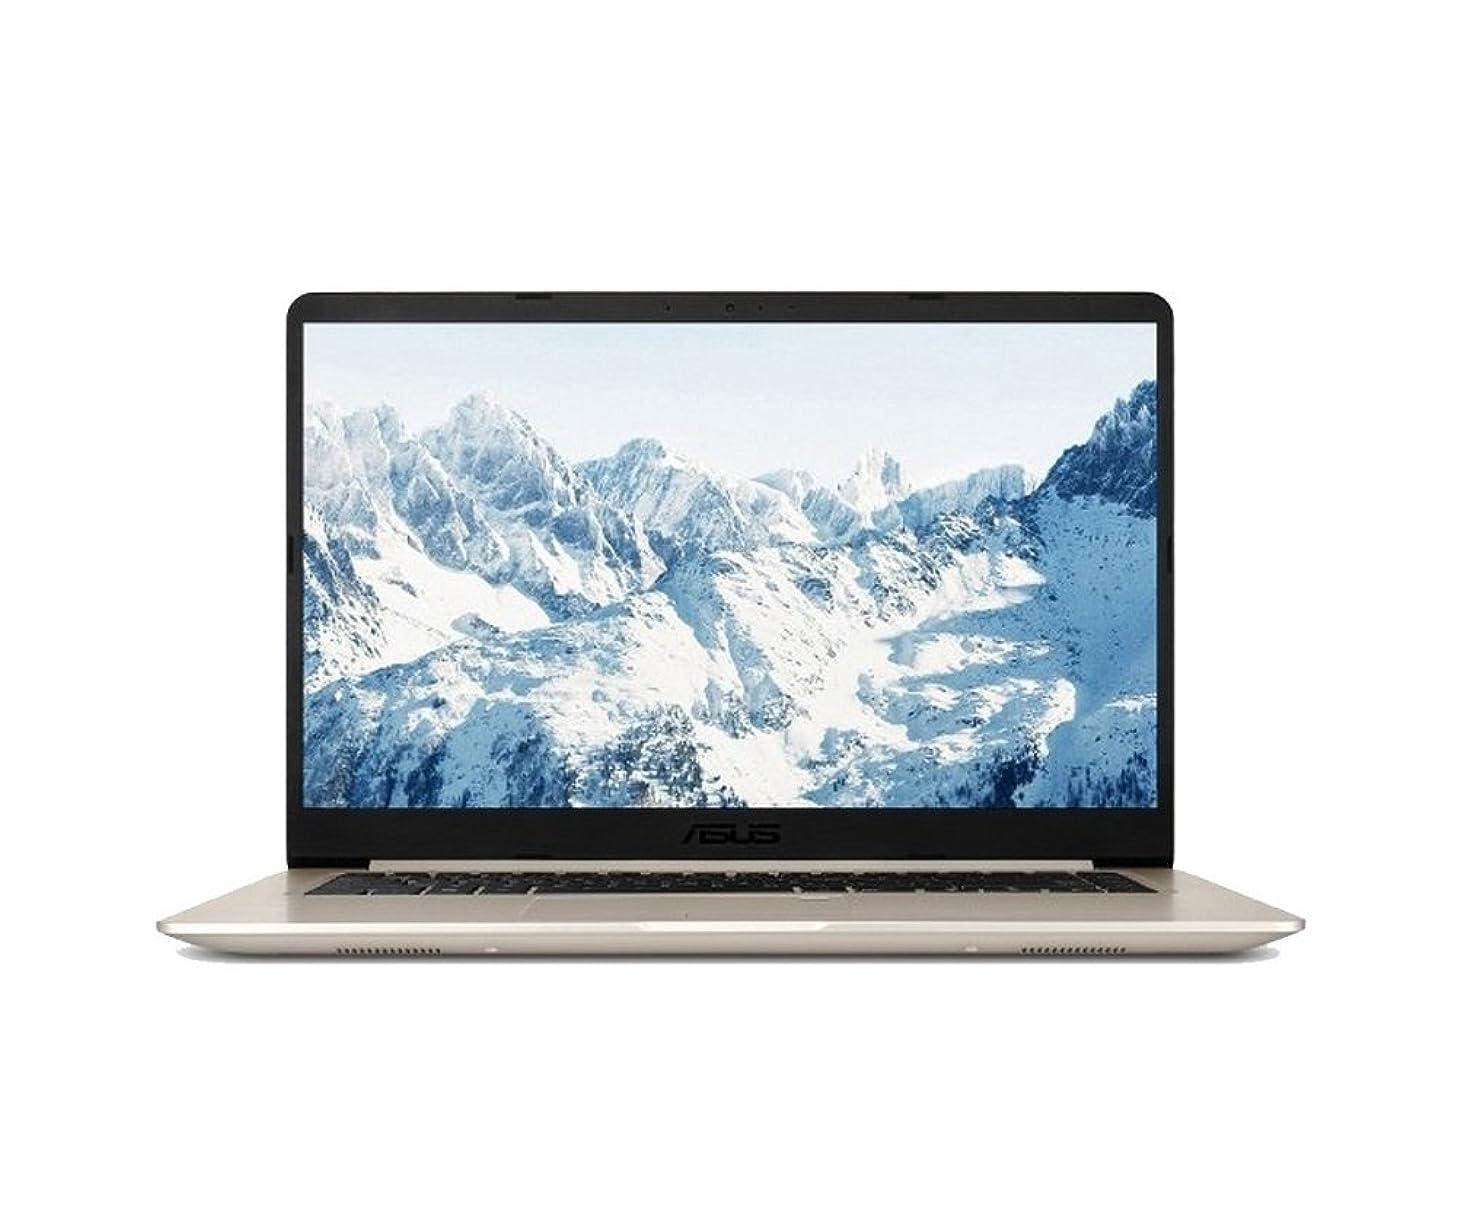 ASUS VivoBook S Notebook (S510UA-RB51) Intel Core i5-7200U, 8GB RAM, 1TB HDD, Win10 64bit